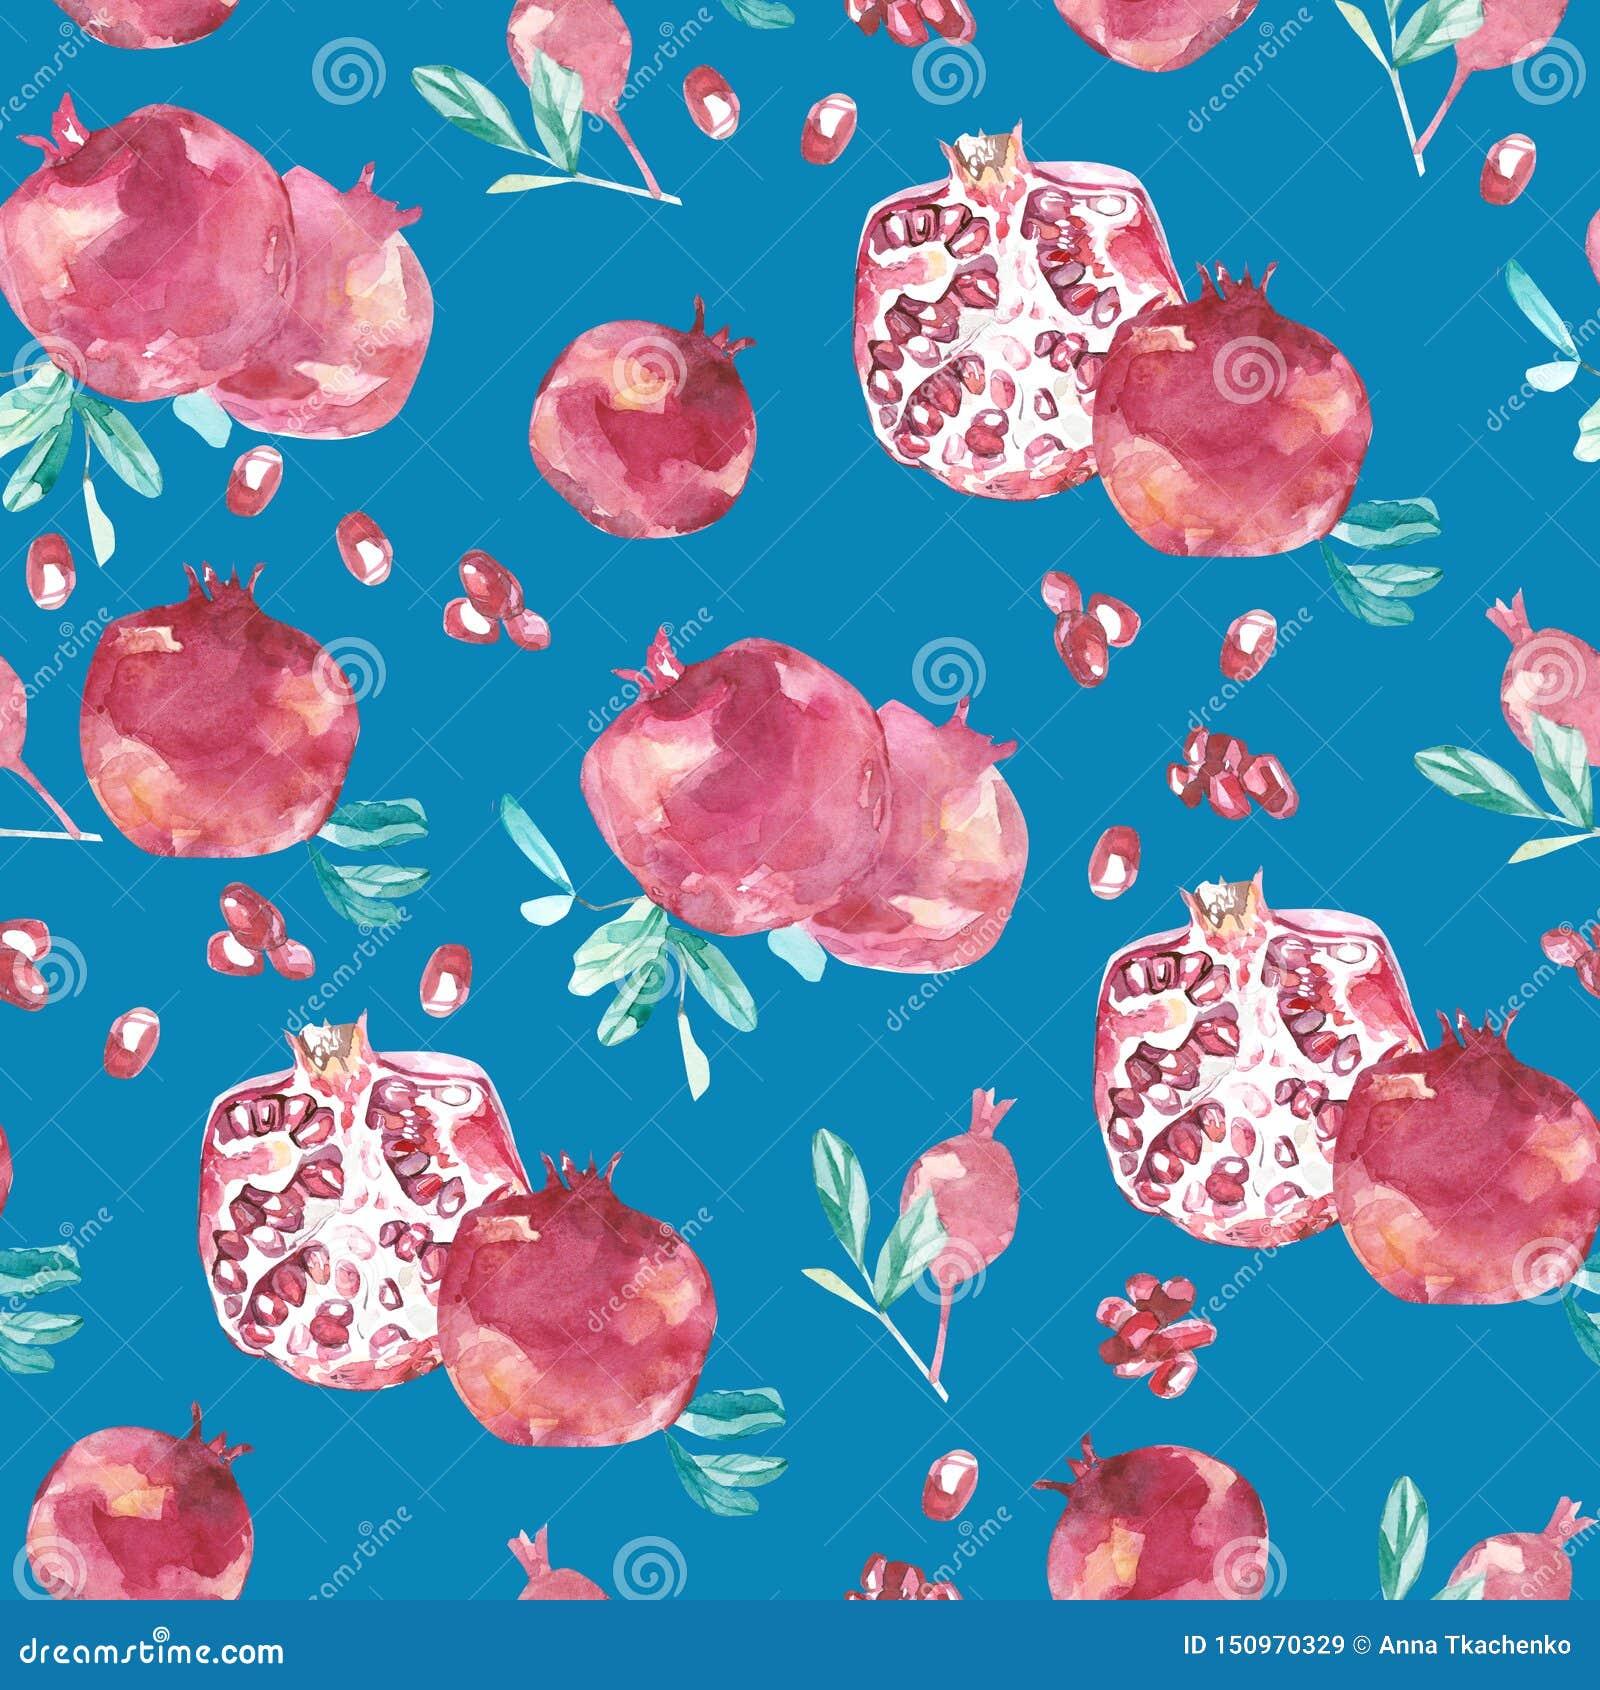 Watercolor Summer Botanical Floral Fruit Pattern